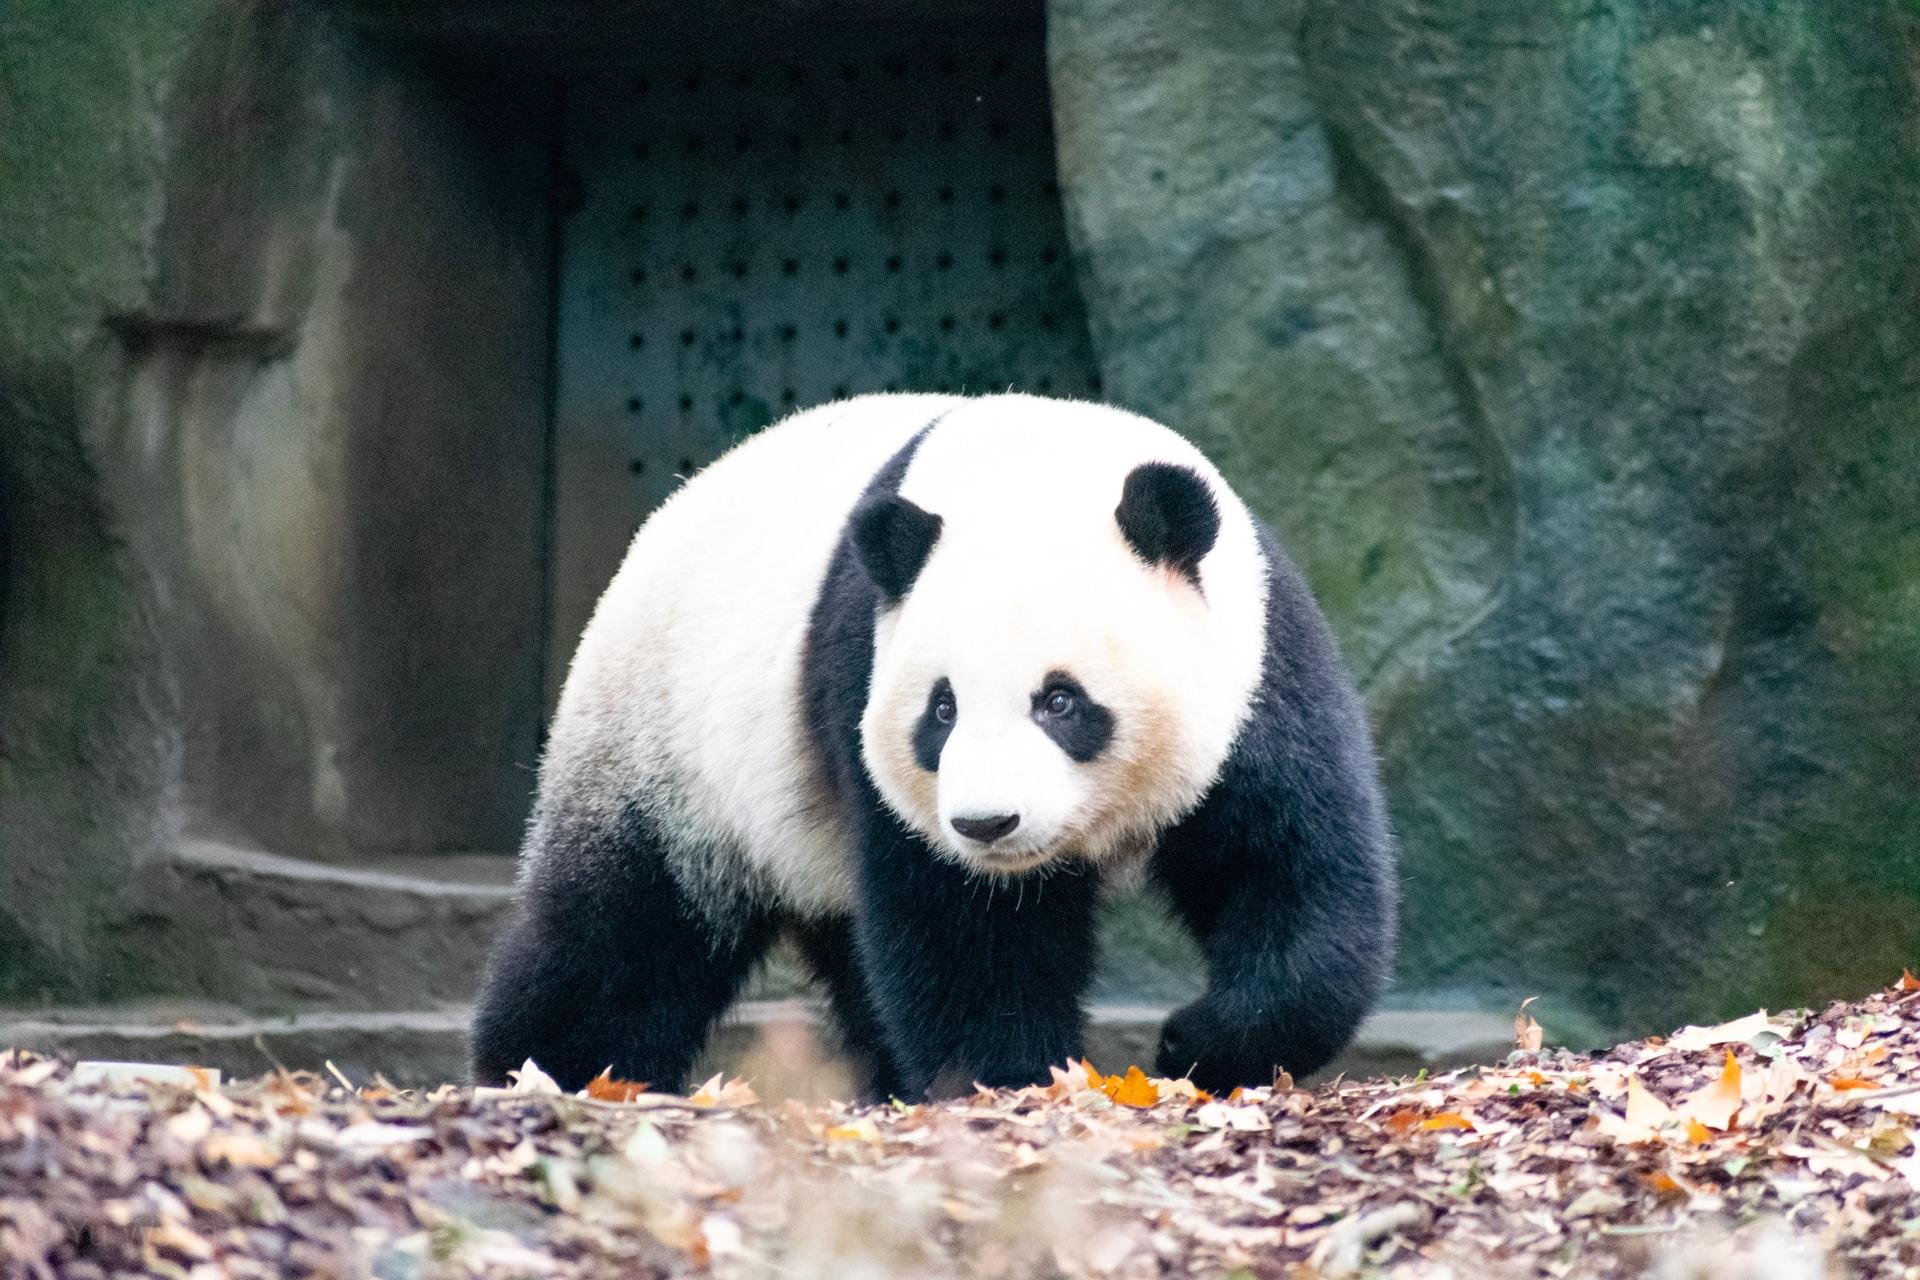 Giant panda twins born at Madrid zoo